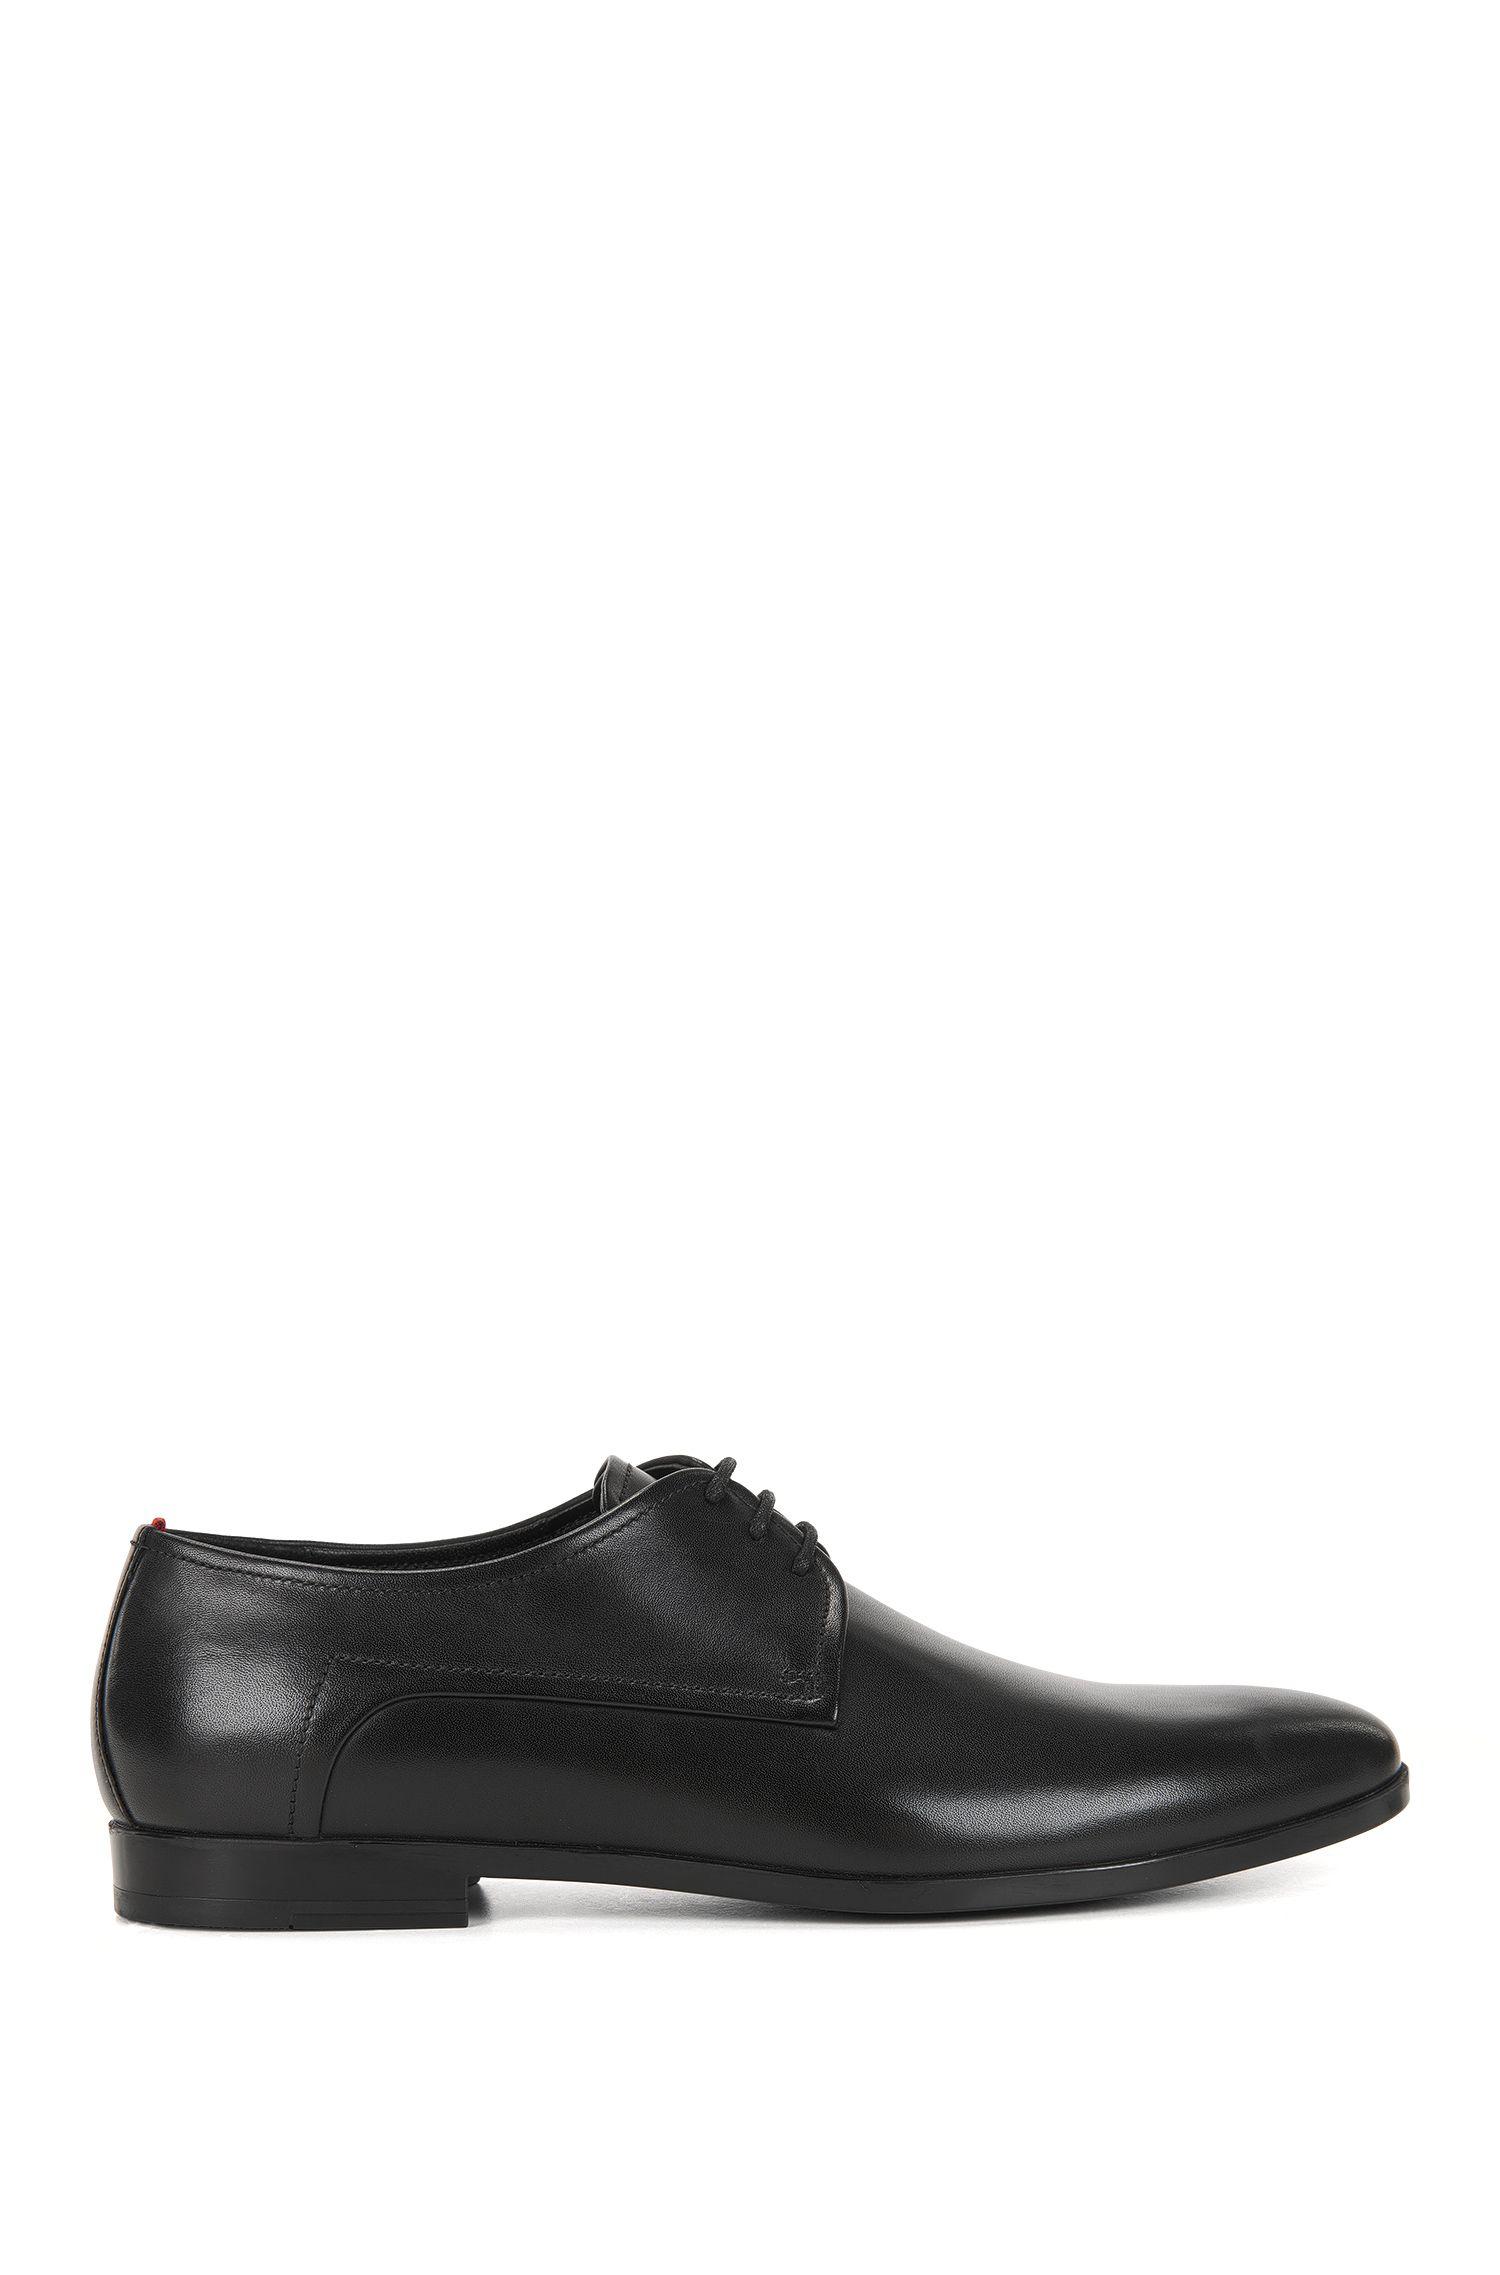 Derby-Schuhe aus softem Leder